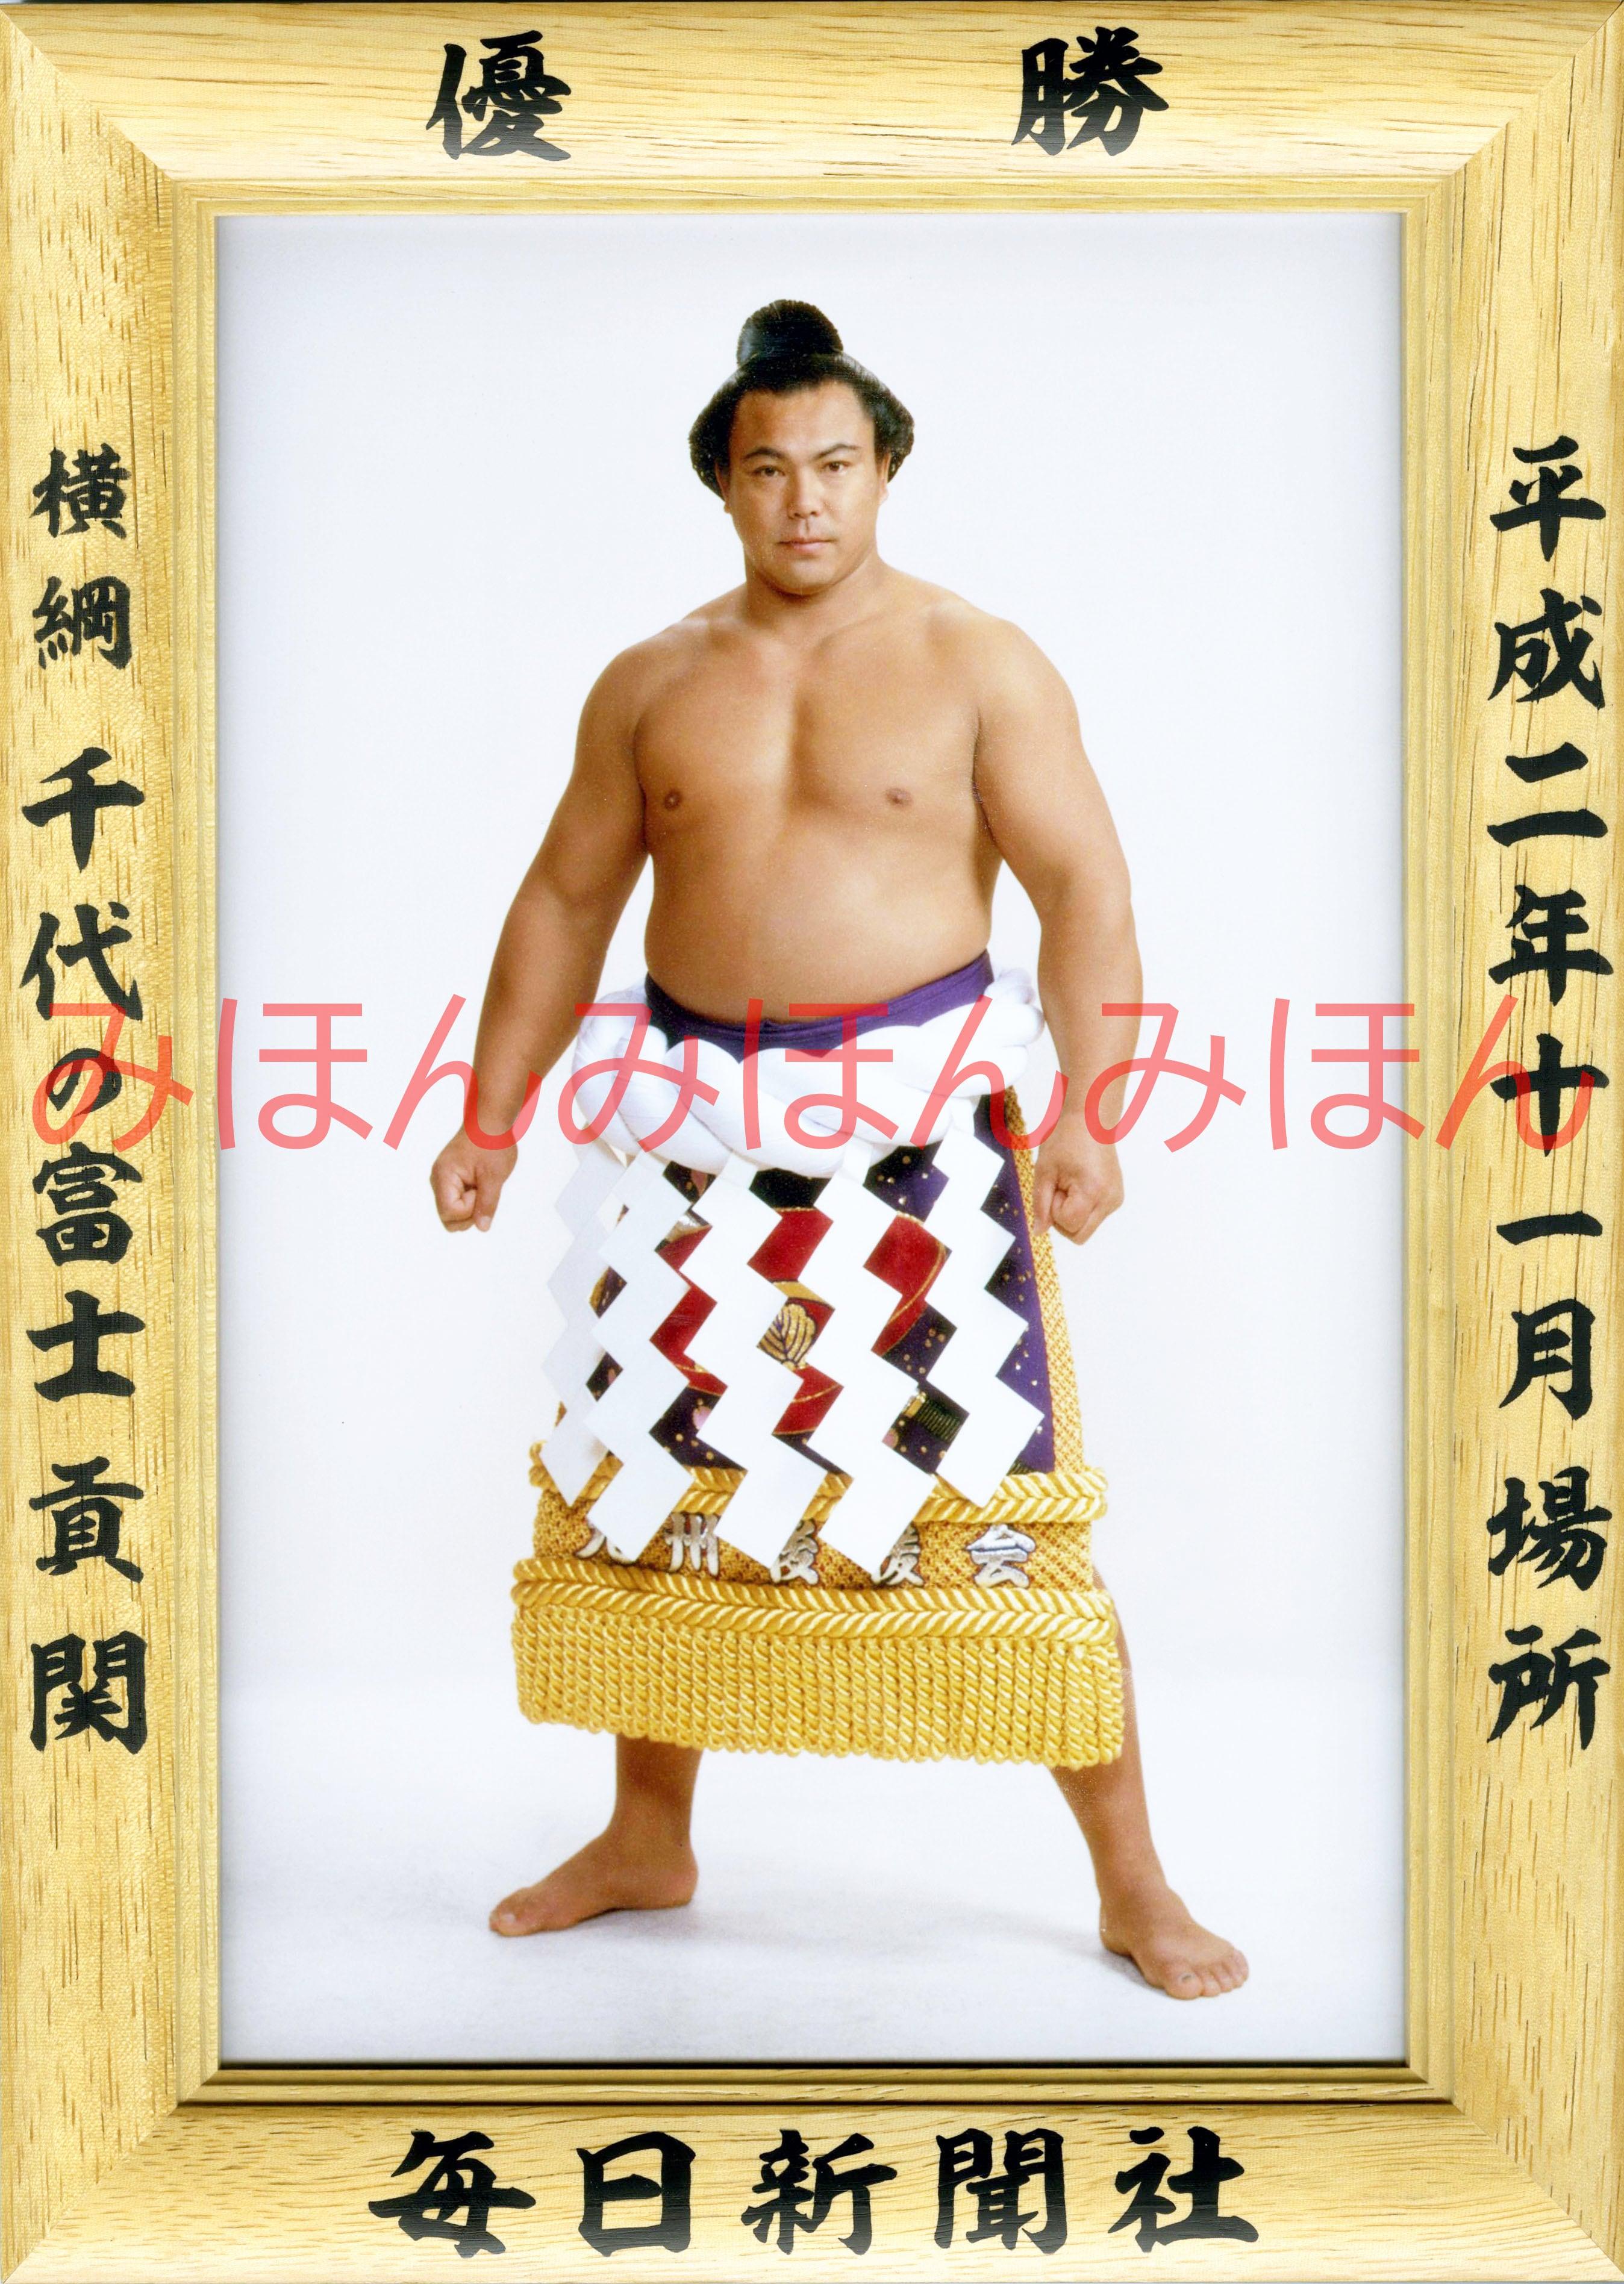 平成2年11月場所優勝 横綱 千代の富士貢関(31回目最後の優勝)